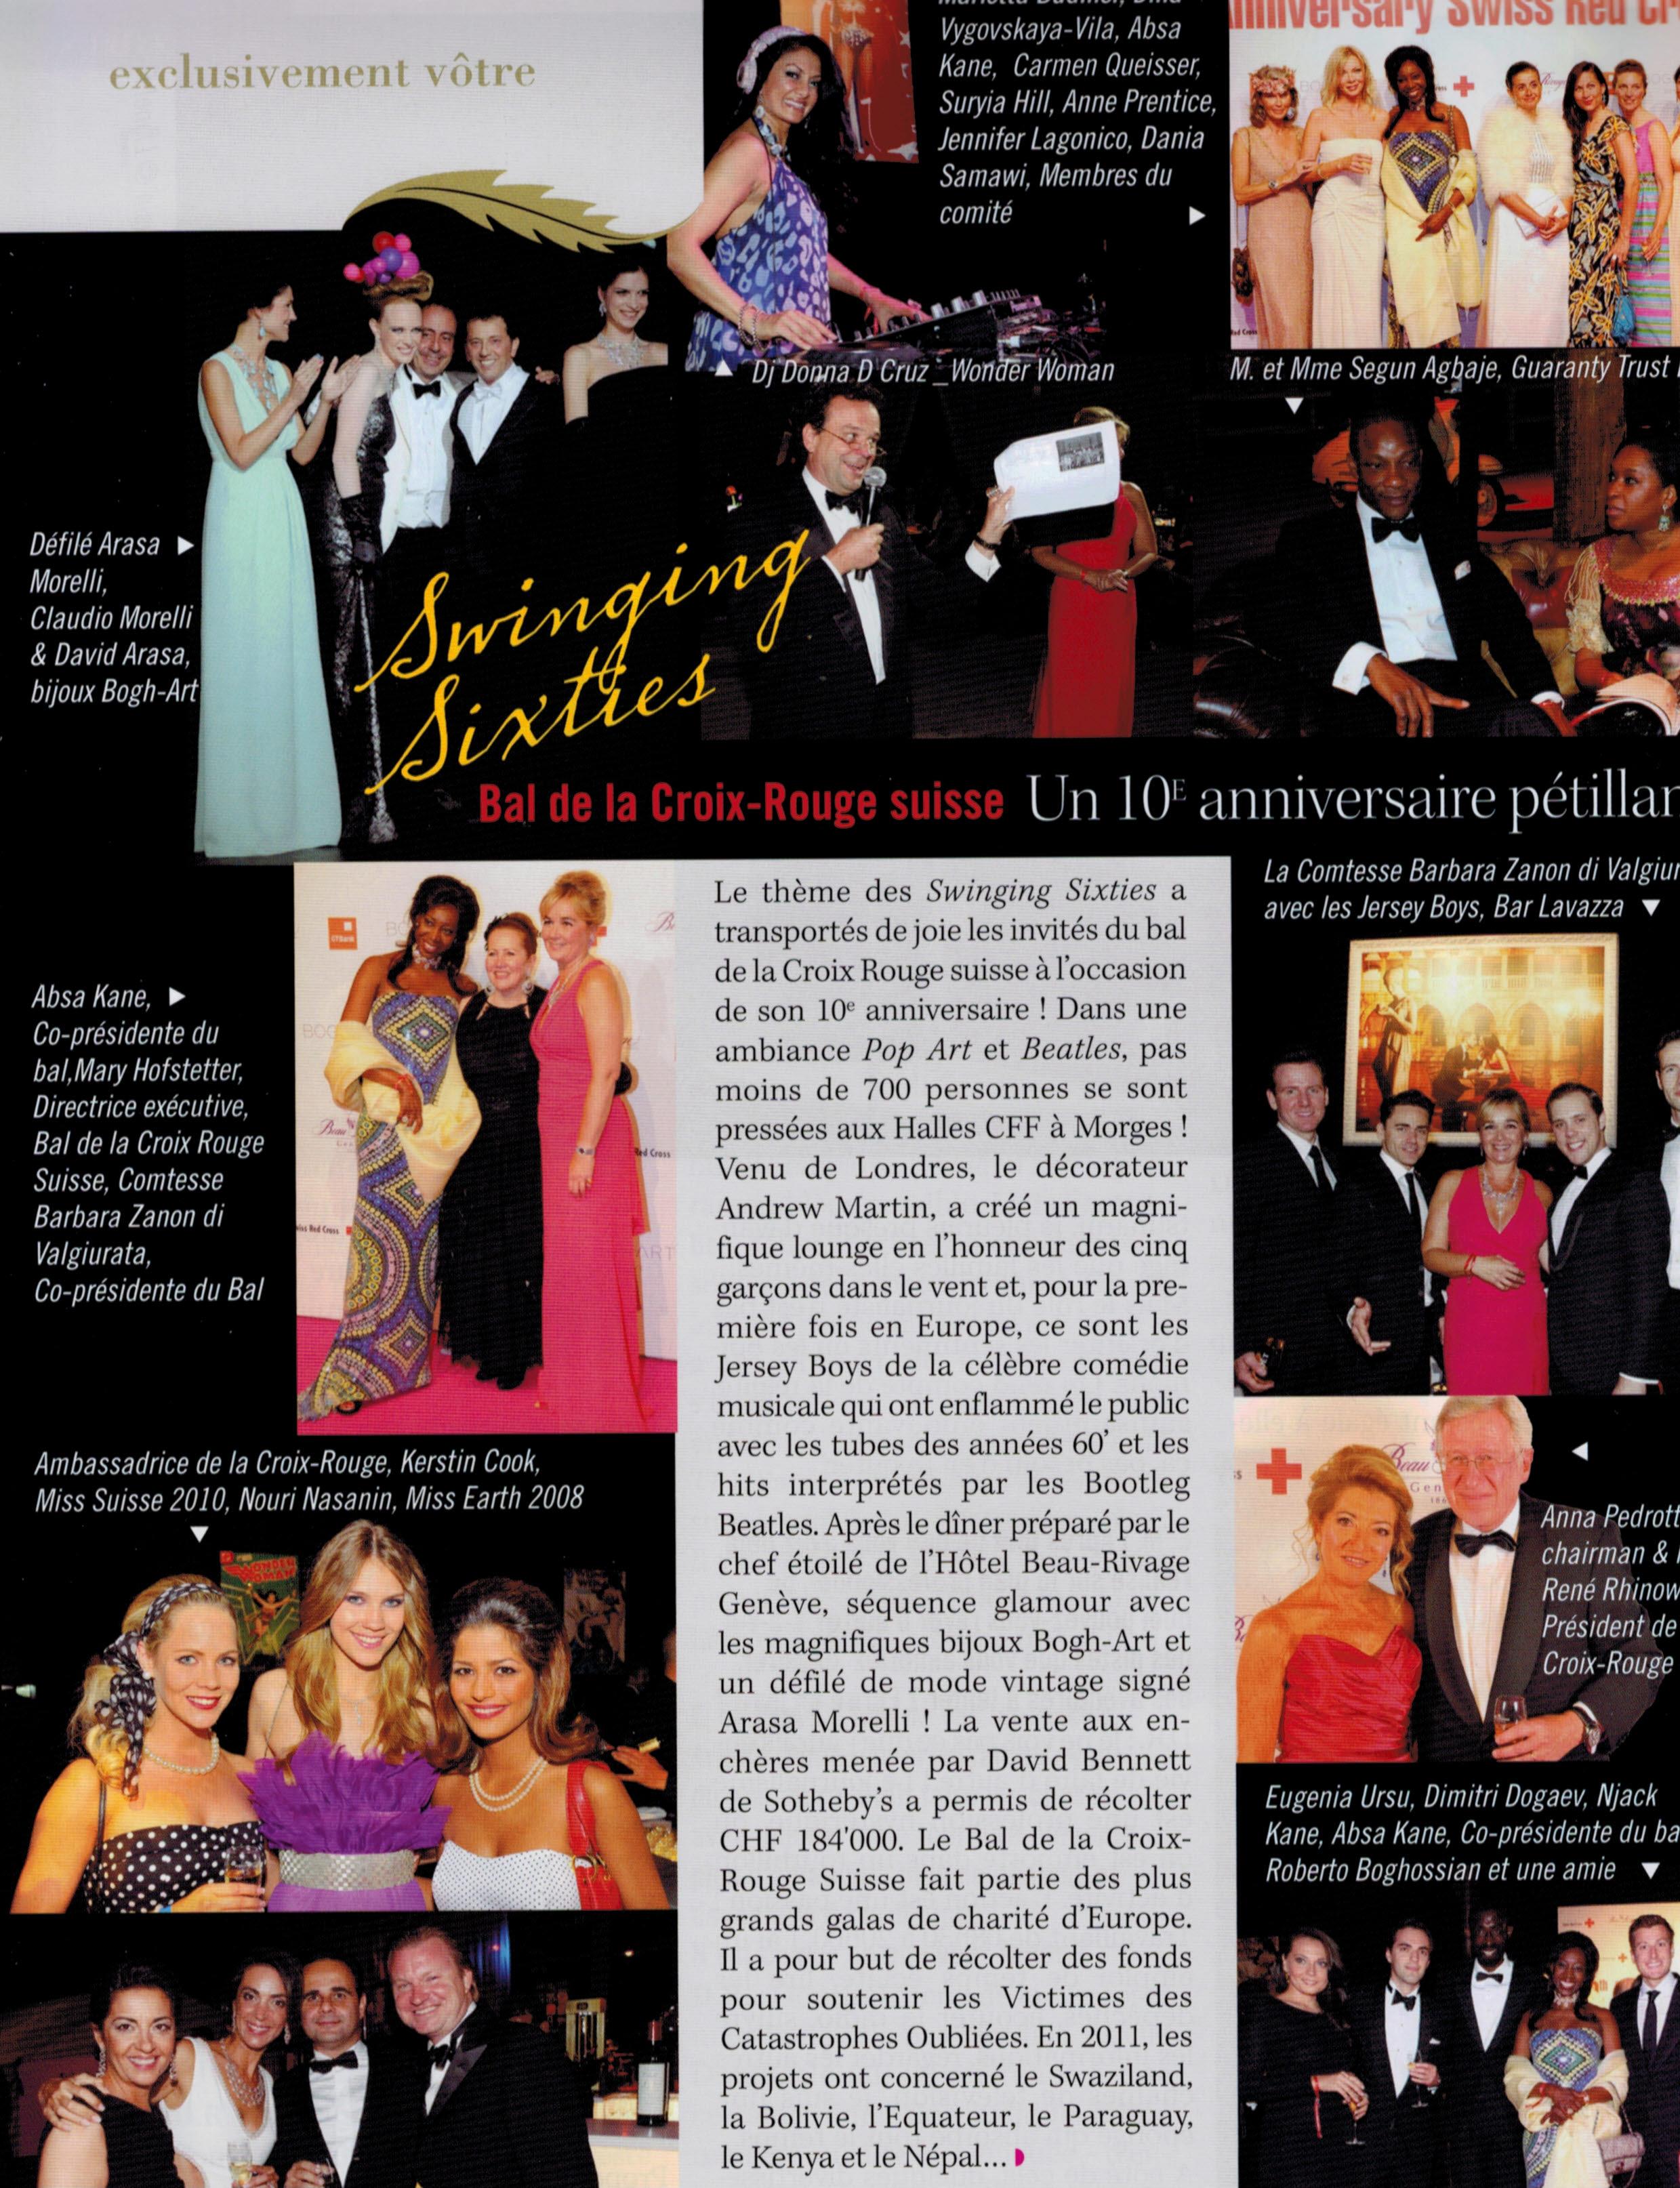 SRC Ball - Exclusif Magazine - 01.02.12